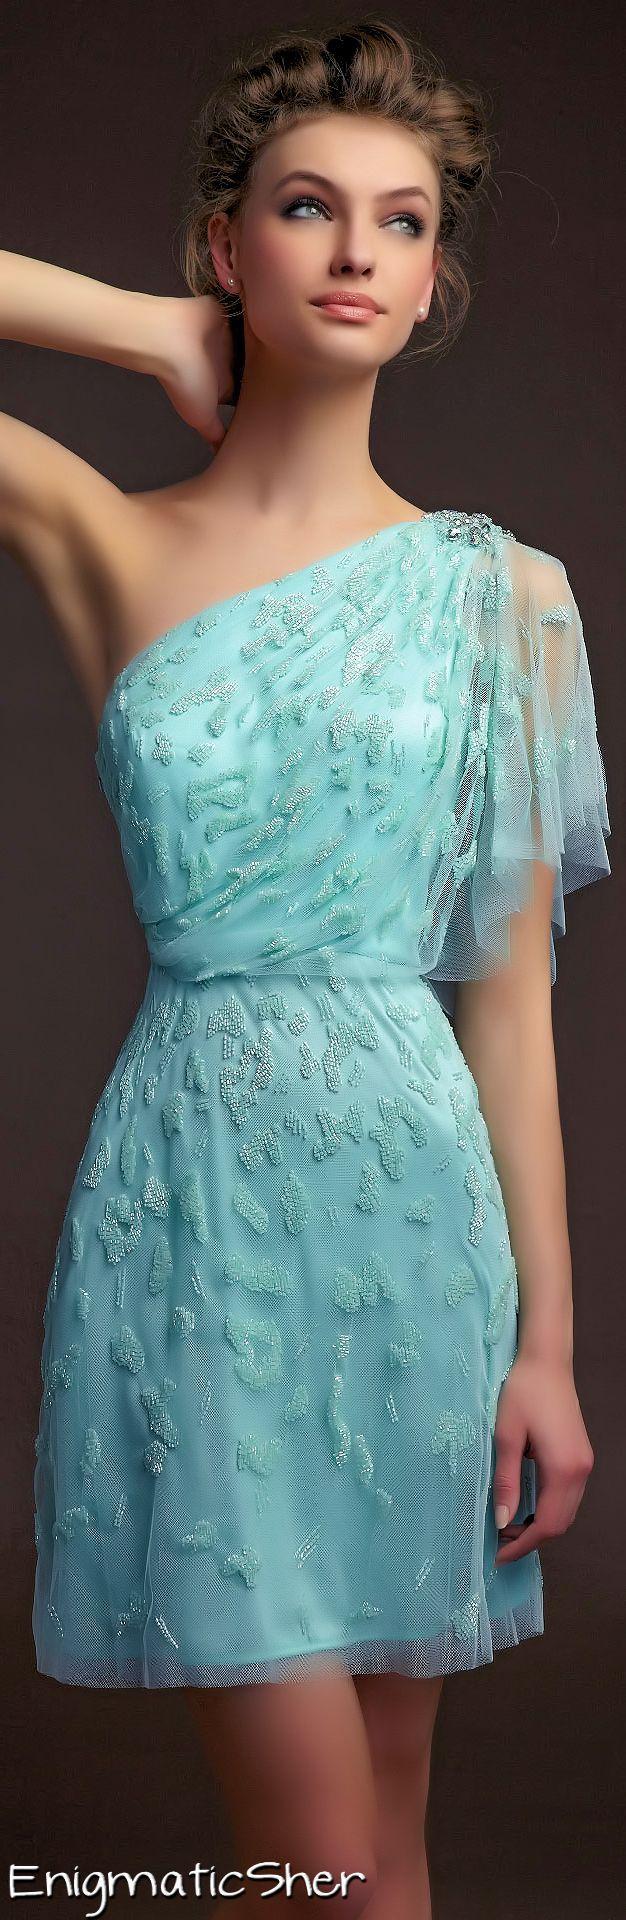 443 best Bruidsmeisjes images on Pinterest | Formal prom dresses ...